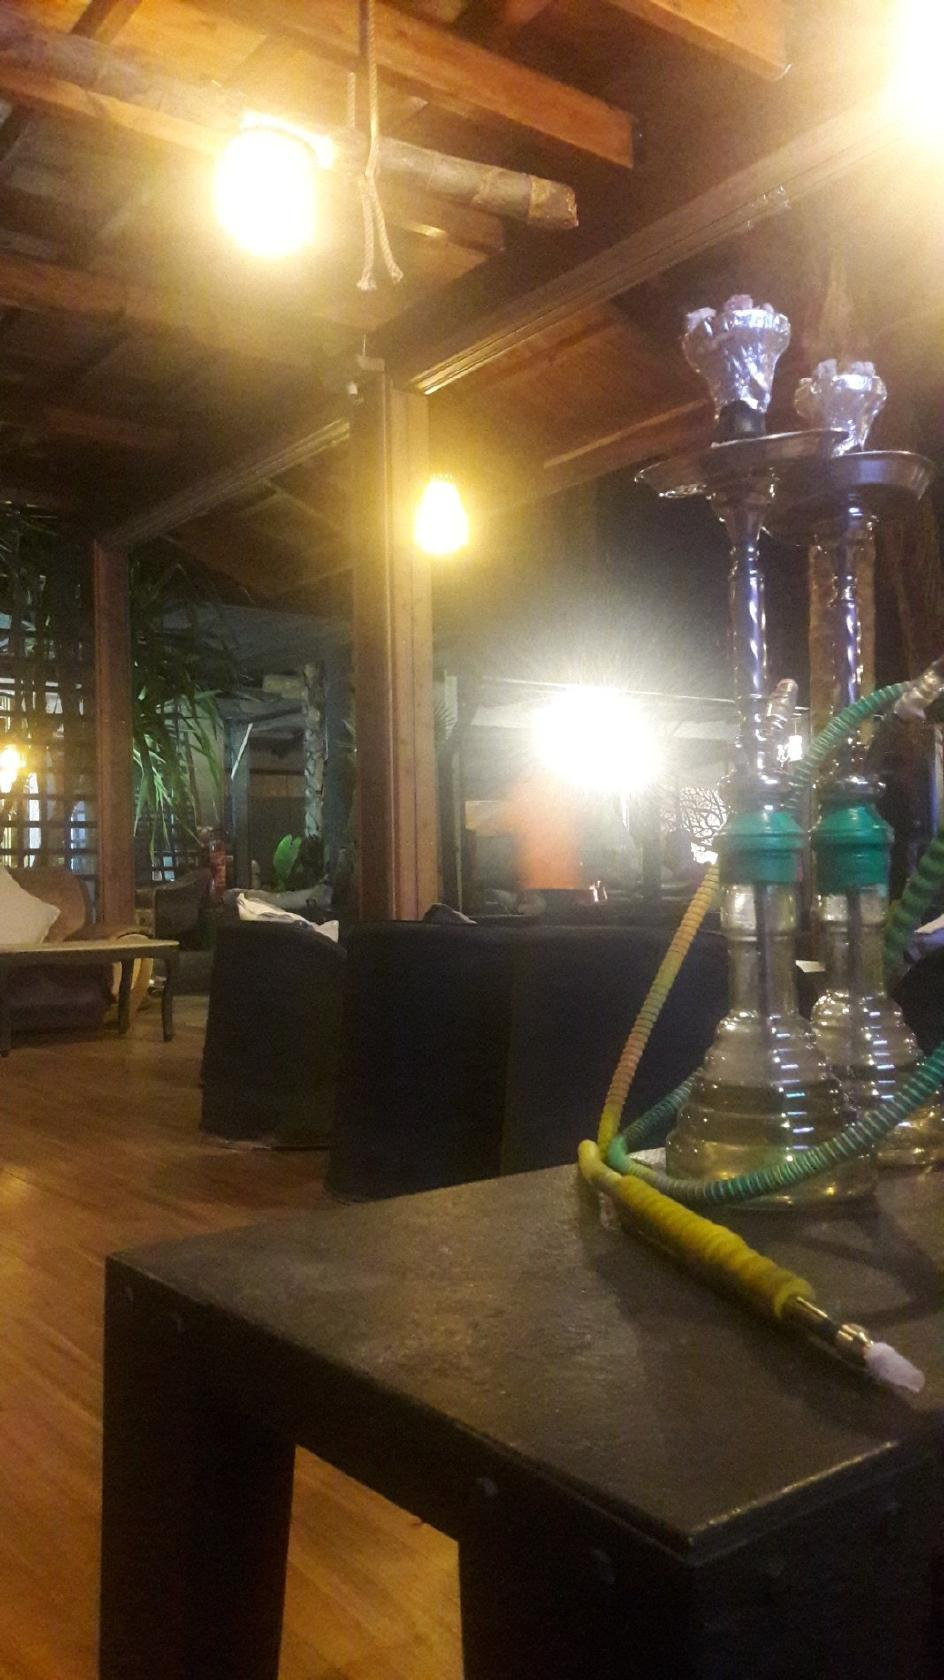 Kenitra Gharb Chrarda Beni Hssen Morocco b-fly pub & bar, kenitra - restaurant reviews